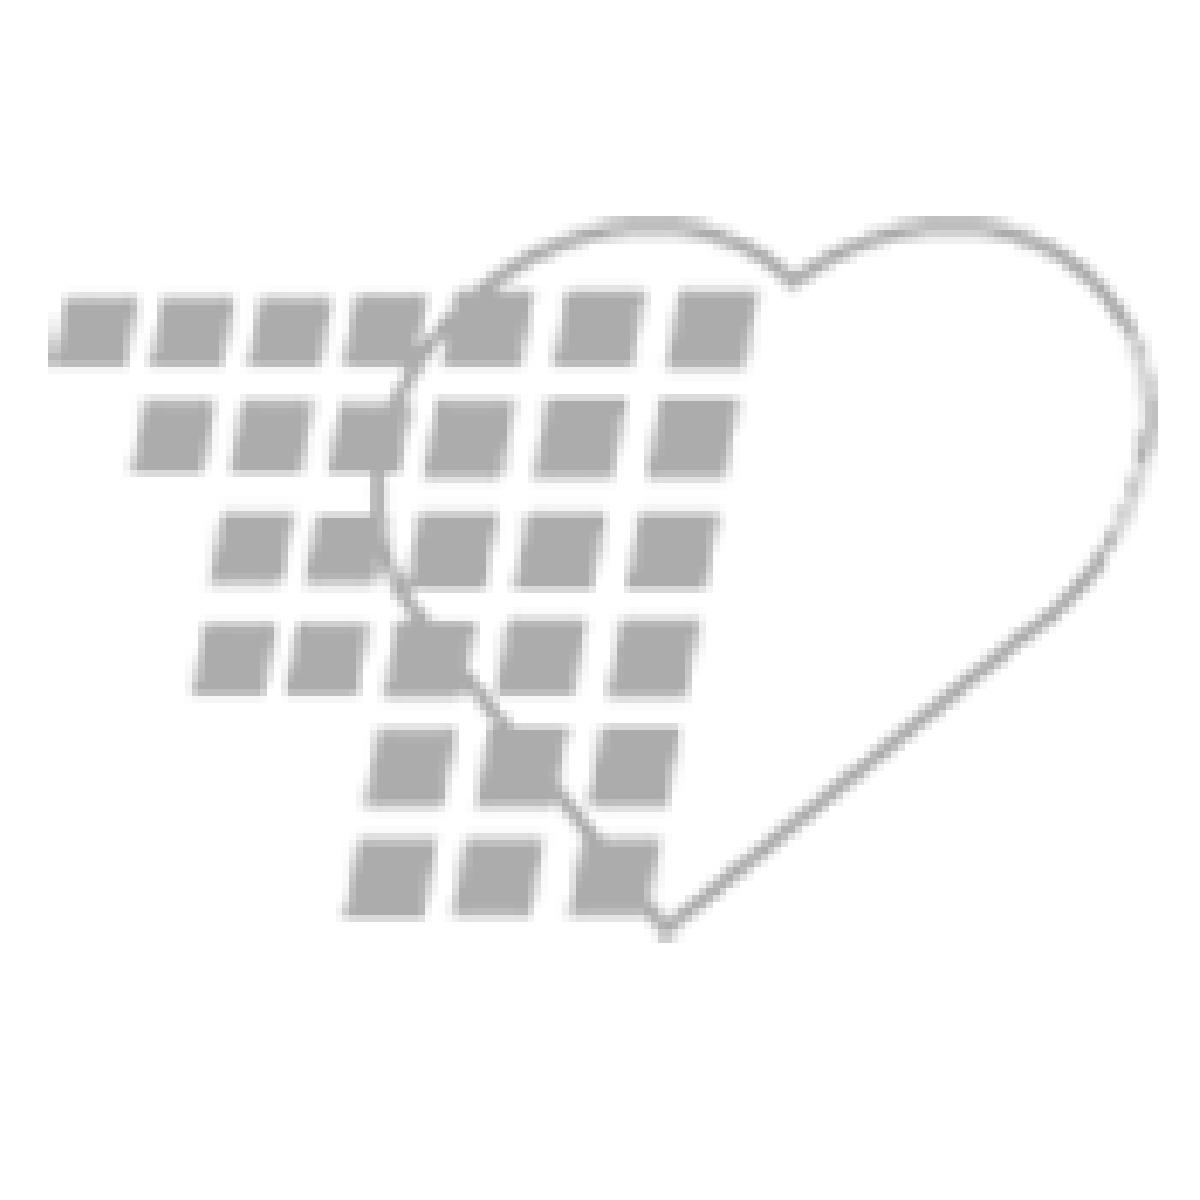 06-93-0739 Demo Dose® Meloxicm (Mobc) 15mg - 100 Pills/Box